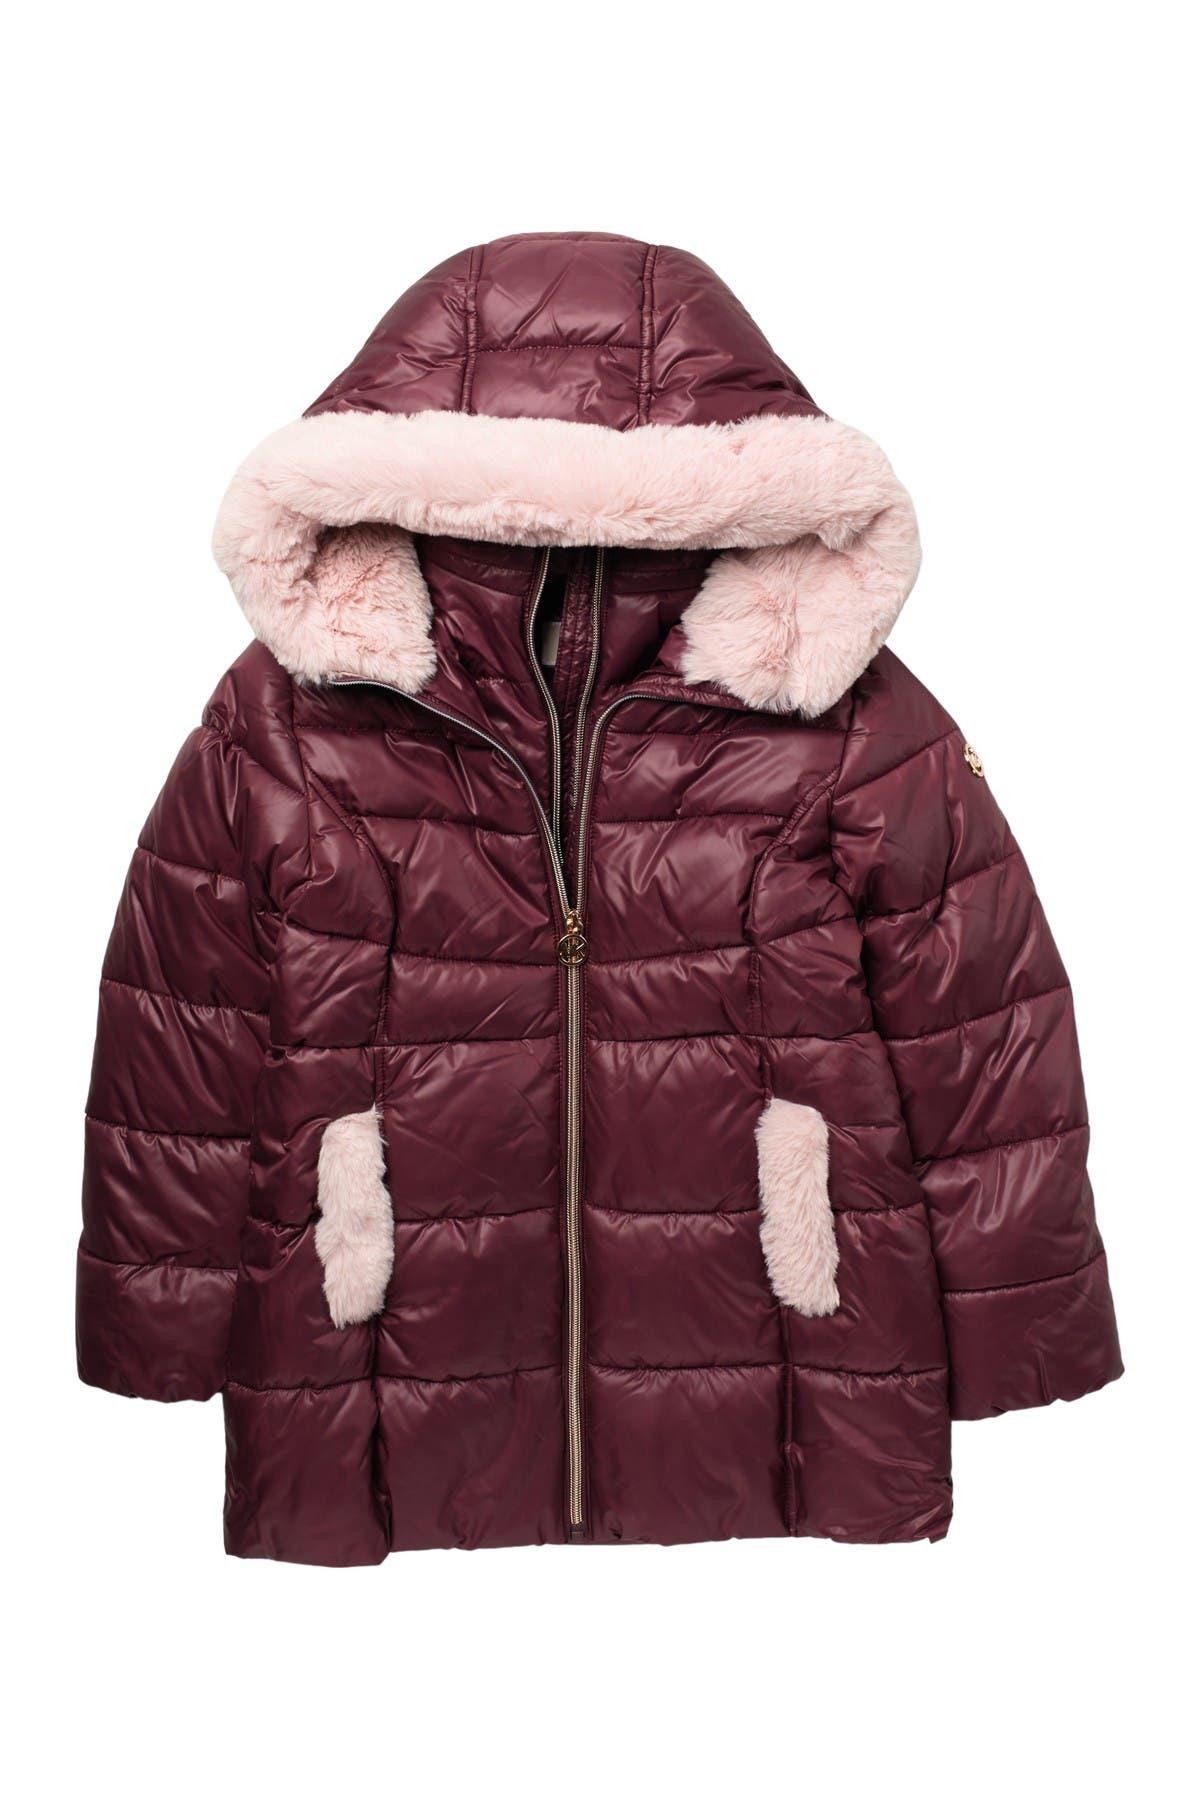 Image of Michael Kors Heavyweight Stadium Faux Fur Trim Jacket